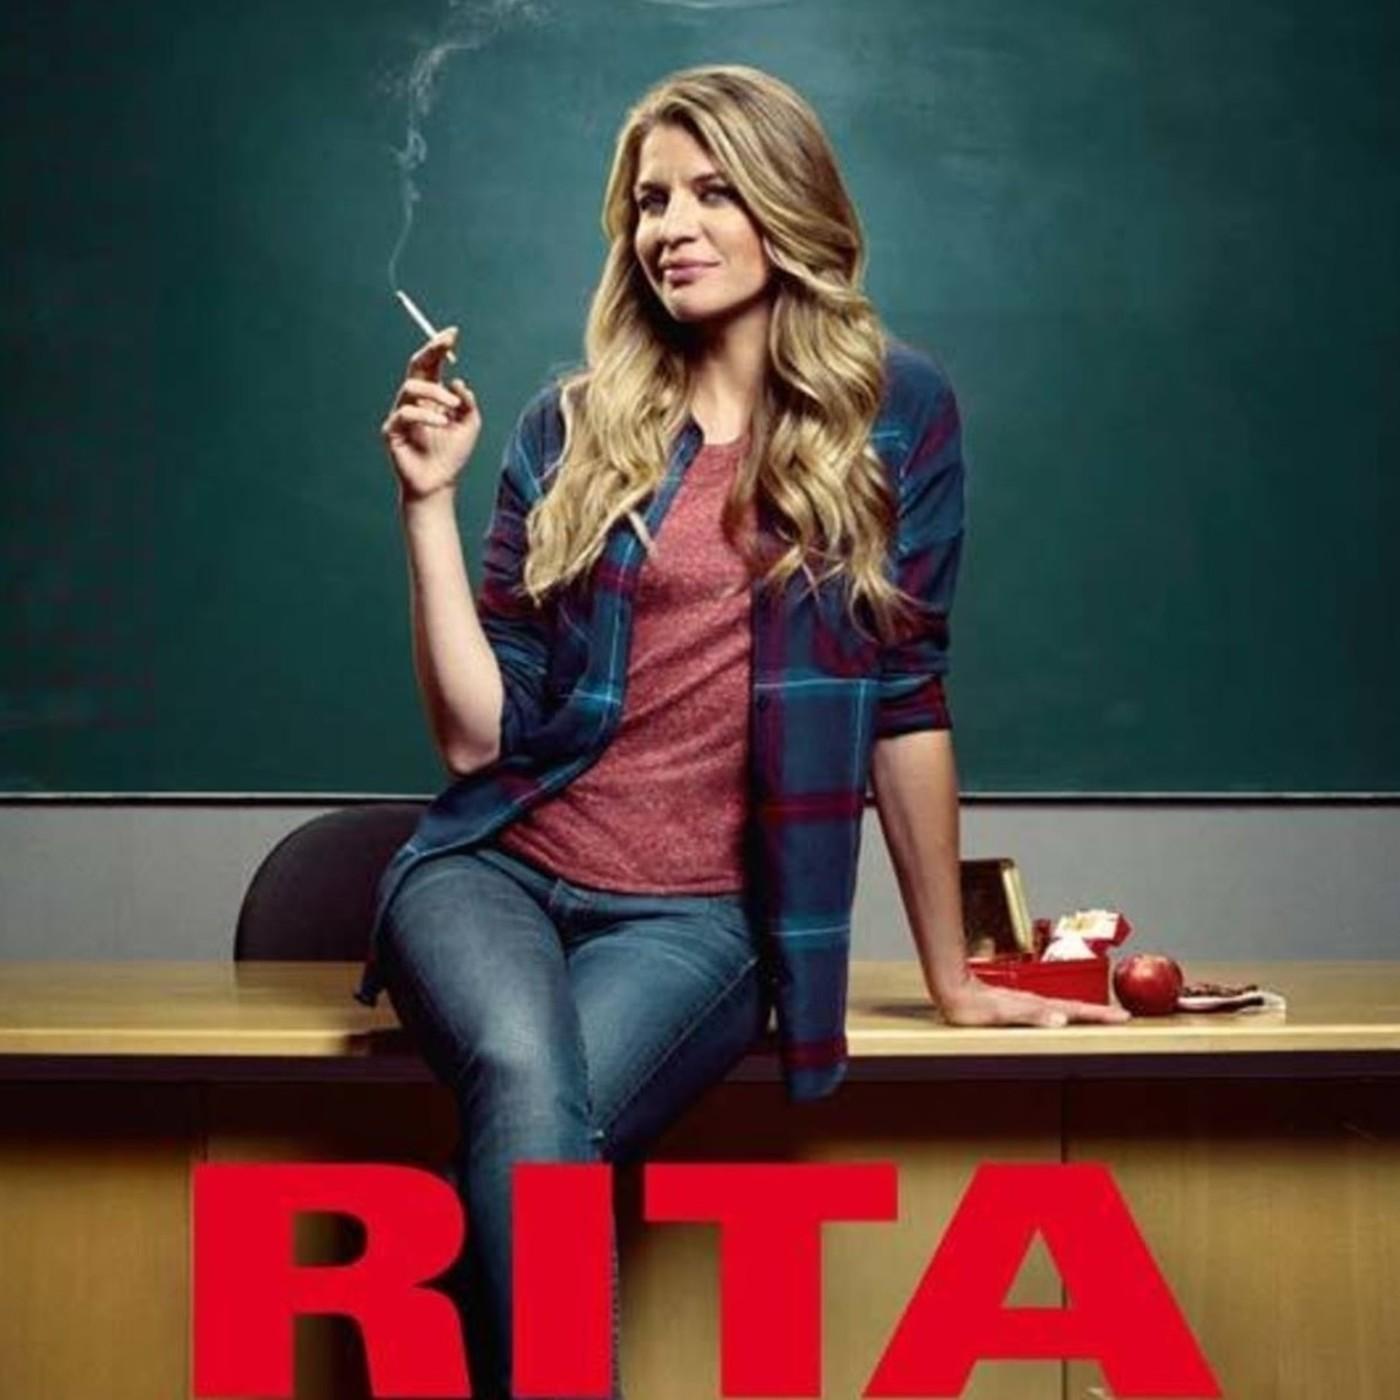 Rita Netflix